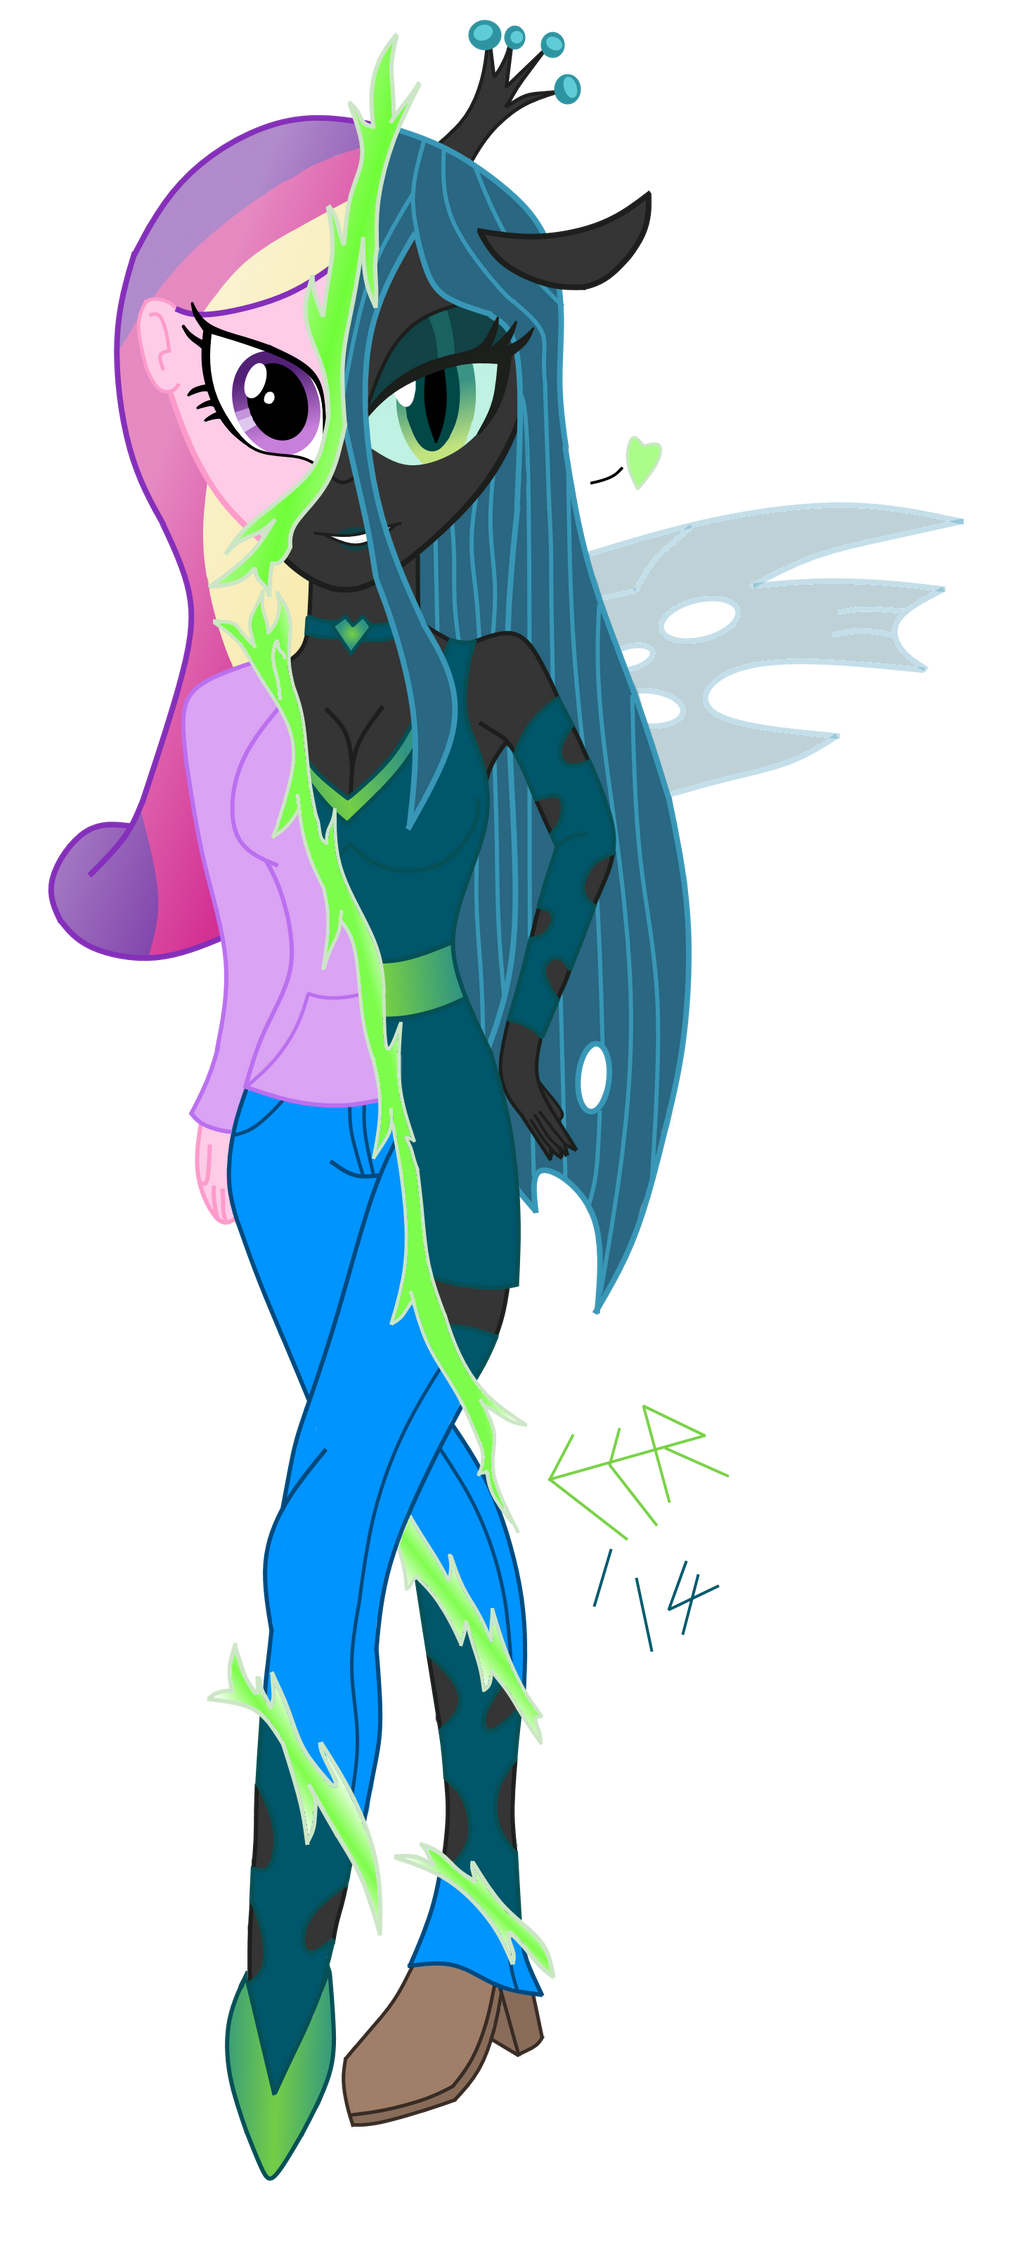 Queen chrysalis equestria girls